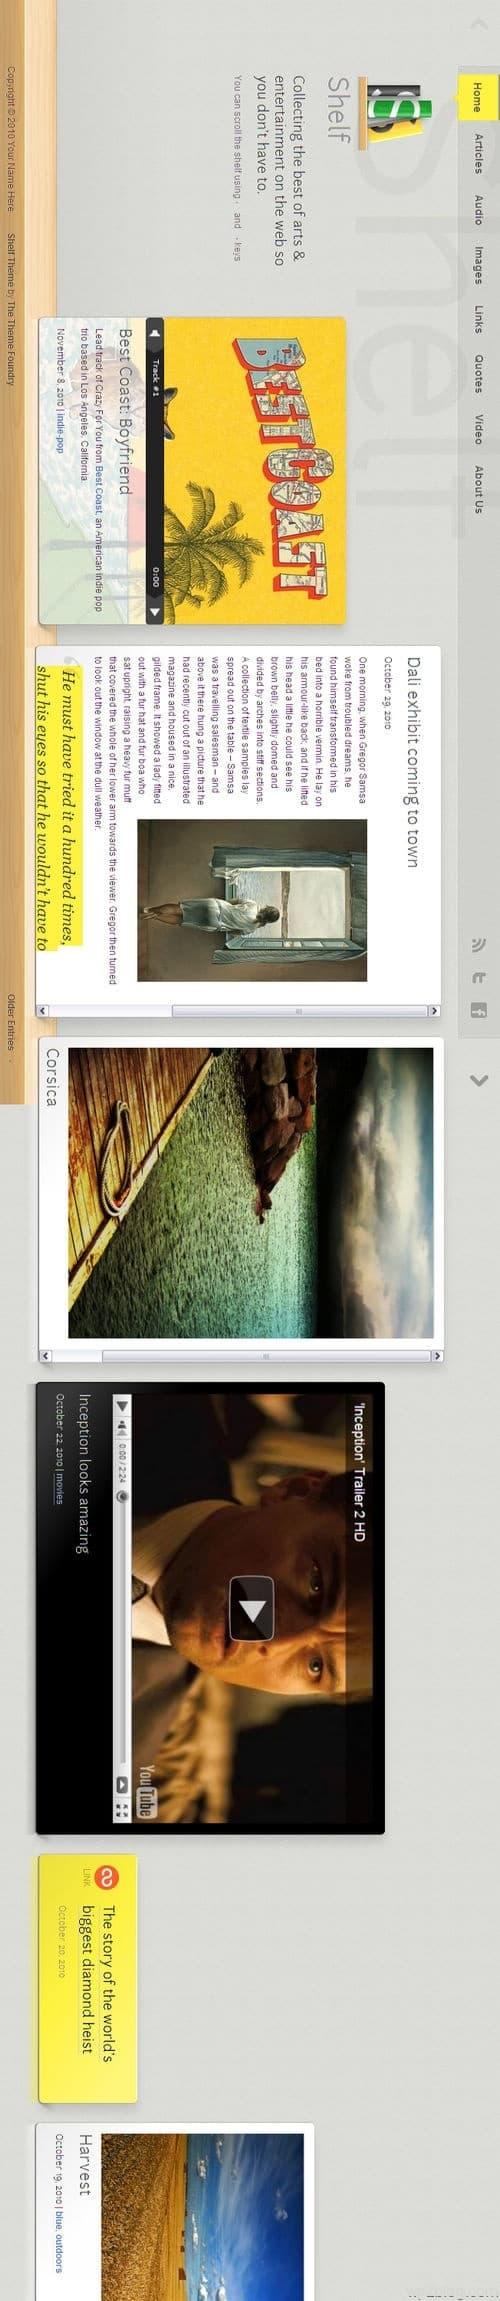 Shelf Tumblr & WordPress Theme Vertical